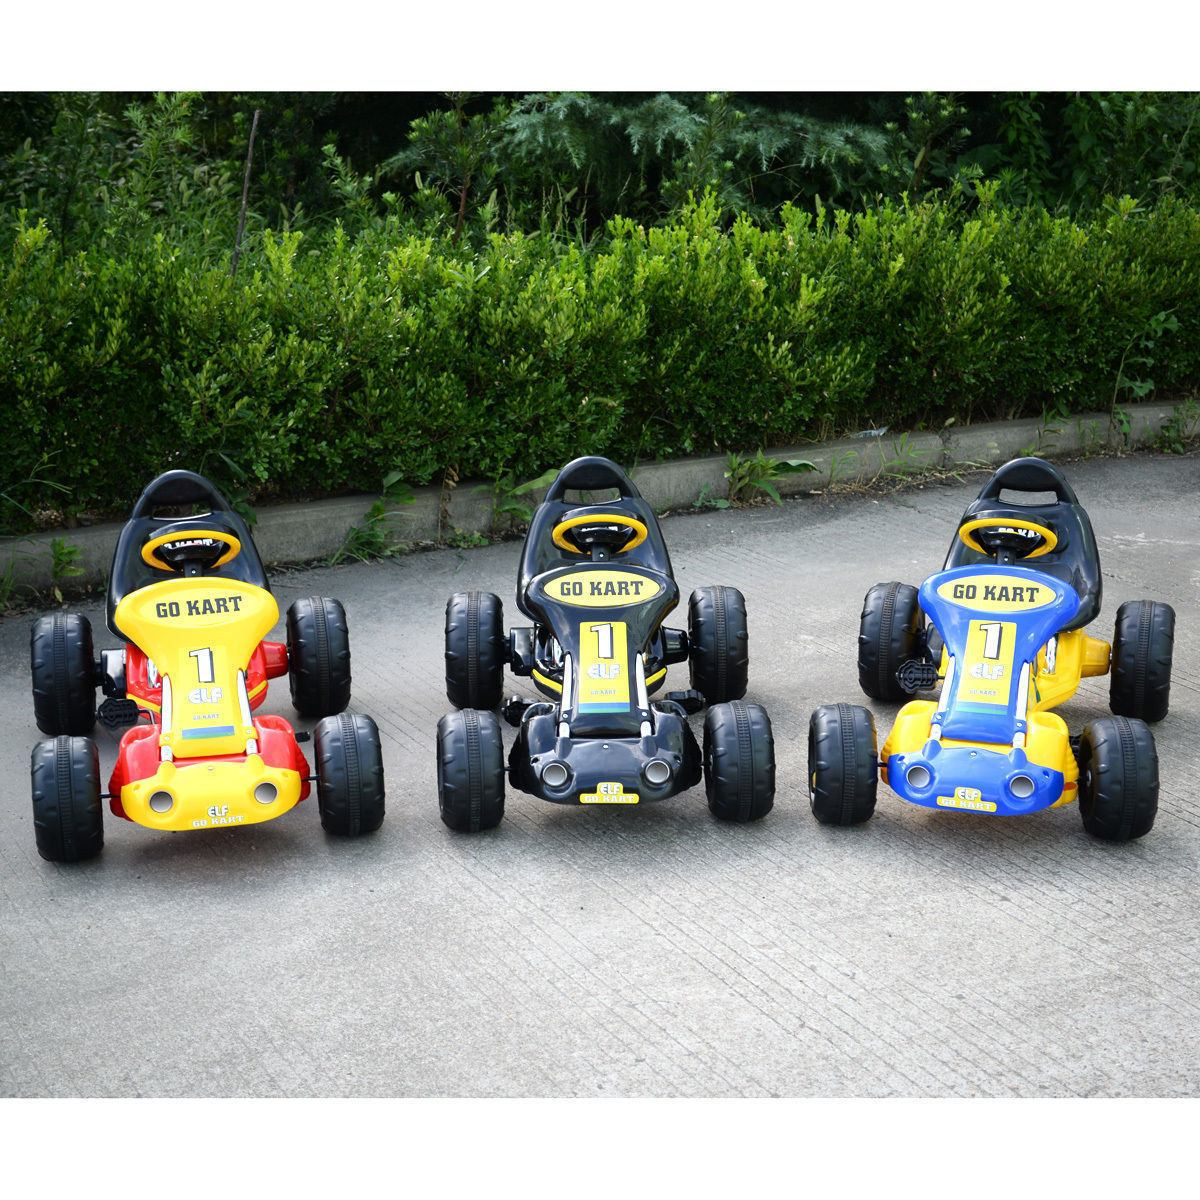 Go Kart Amarillo 4 Ruedas Niños Racer Paseo Al Aire Libre ...